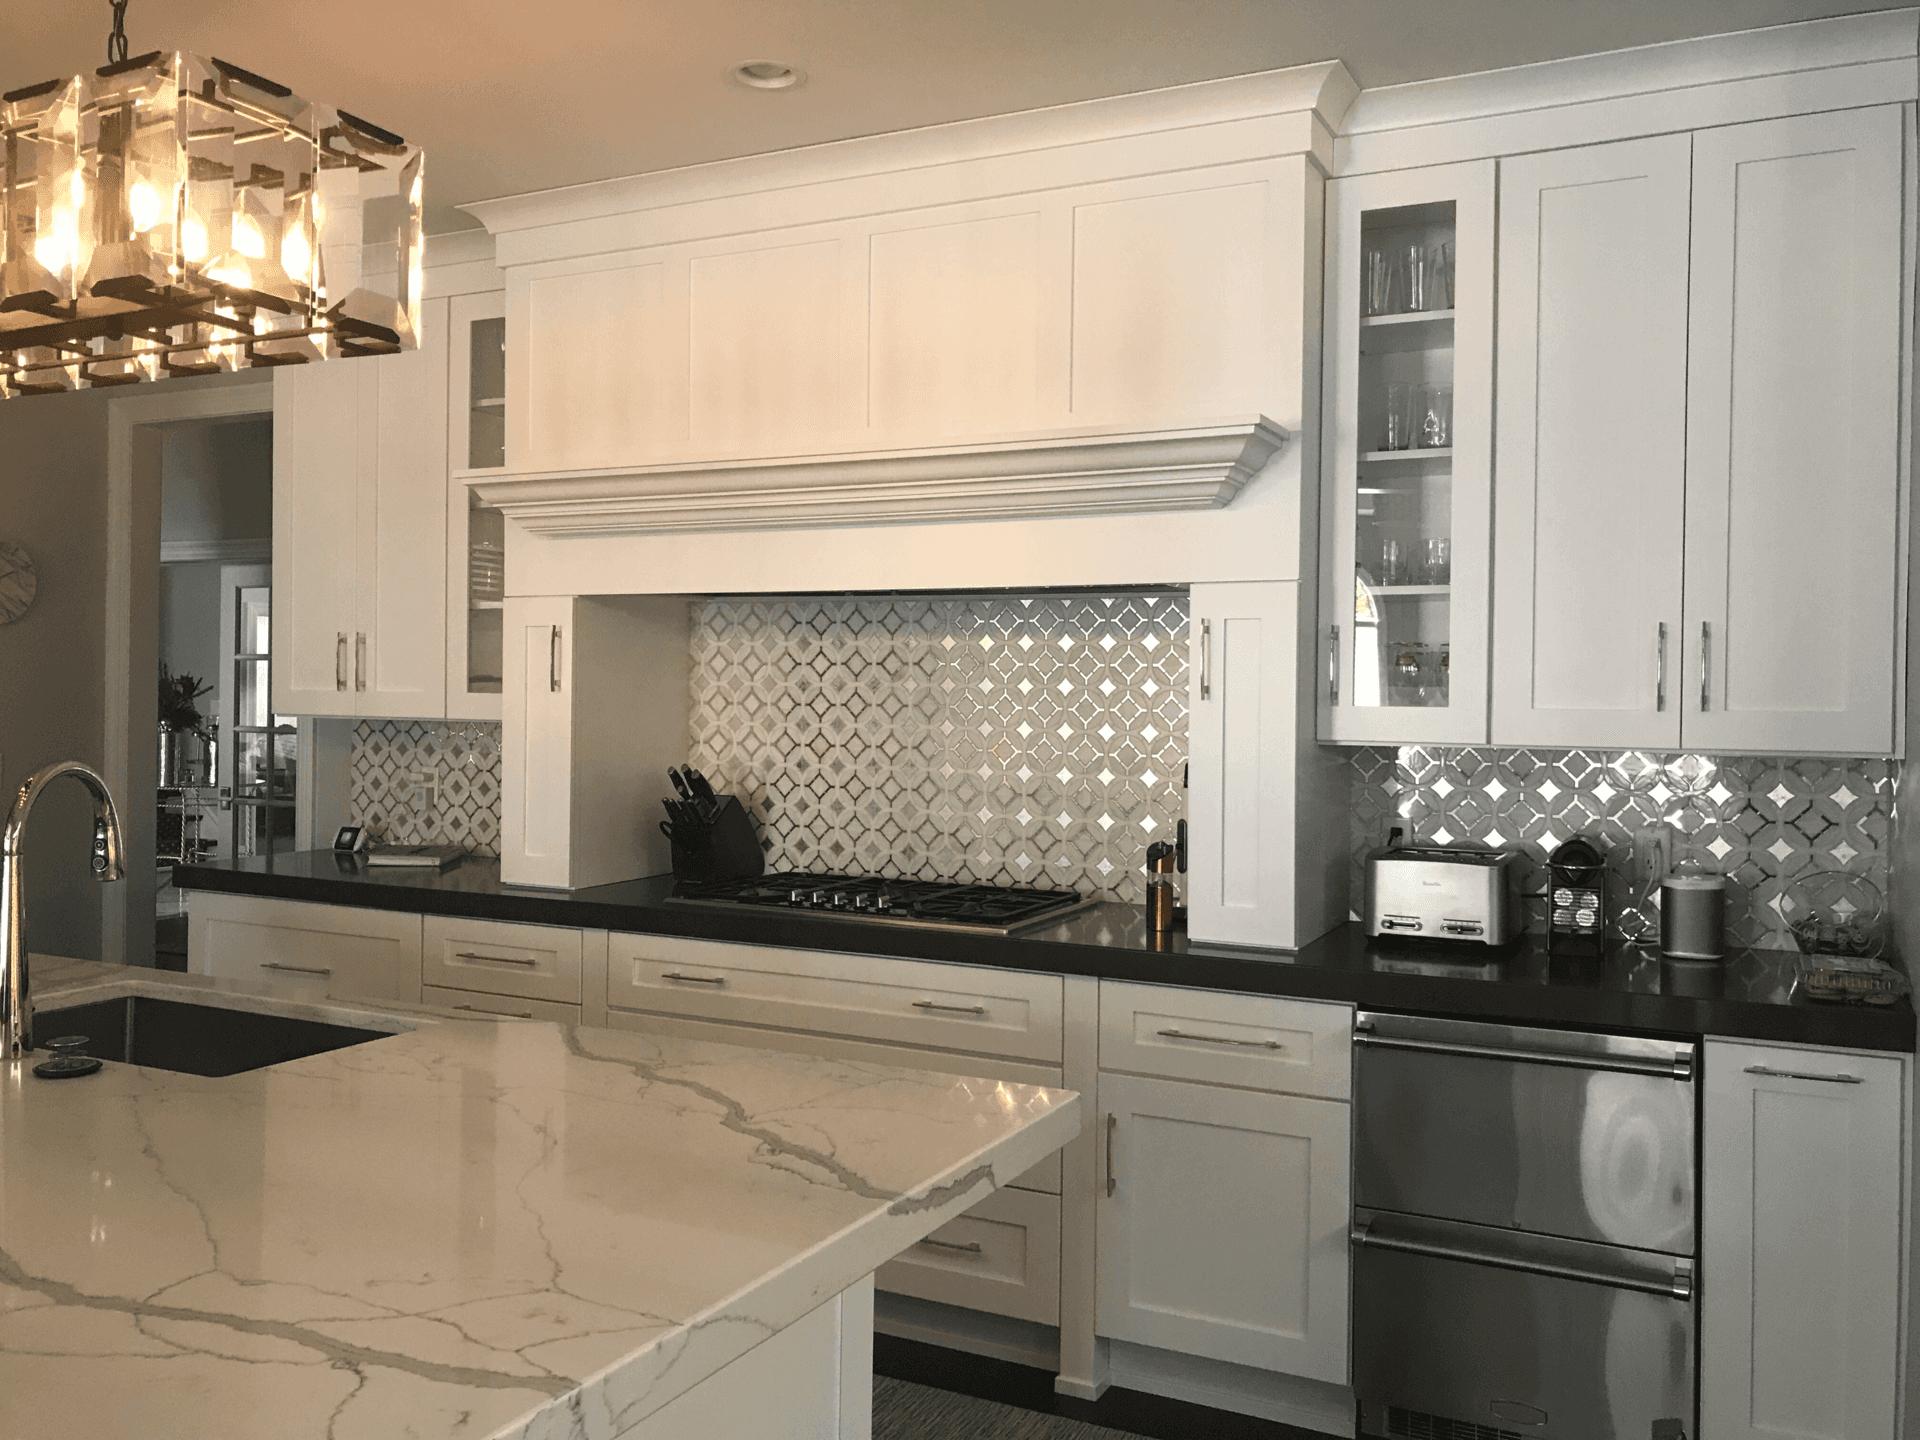 countertops in print kitchen dsc gehman remodeling pa doylestown design